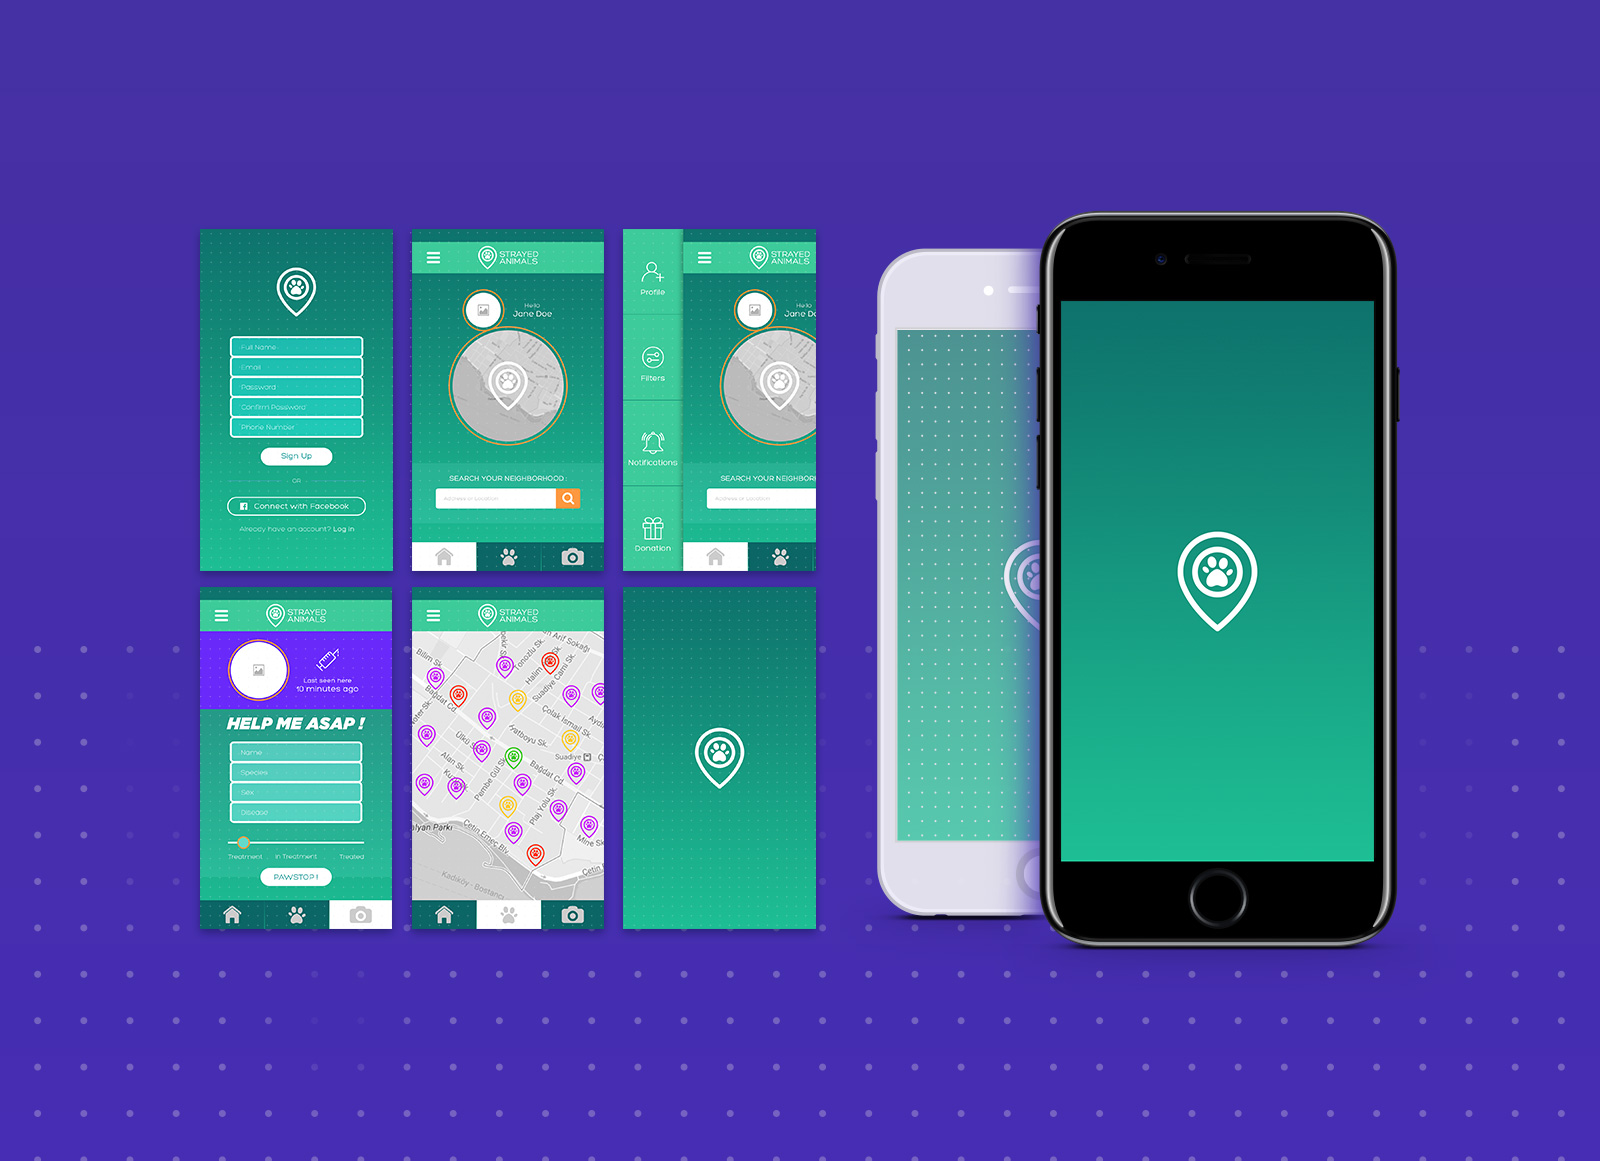 free mobile app design mockup psd file